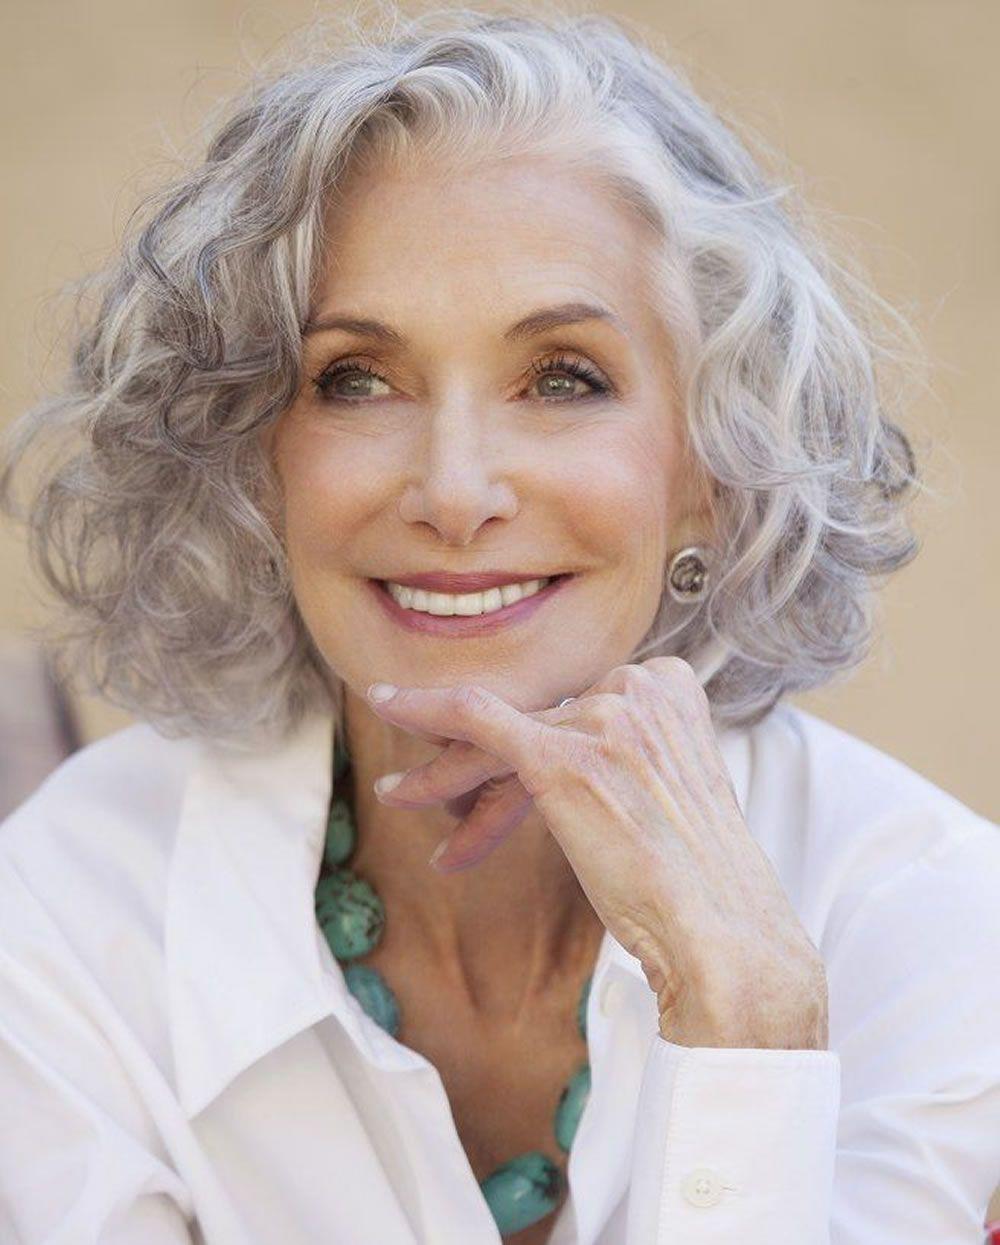 Kurze Graue Frisuren Fur Altere Frauen Uber 50 Graue Haarfarben 2018 Altere F Hair Styles For Women Over 50 Older Women Hairstyles Haircut For Older Women